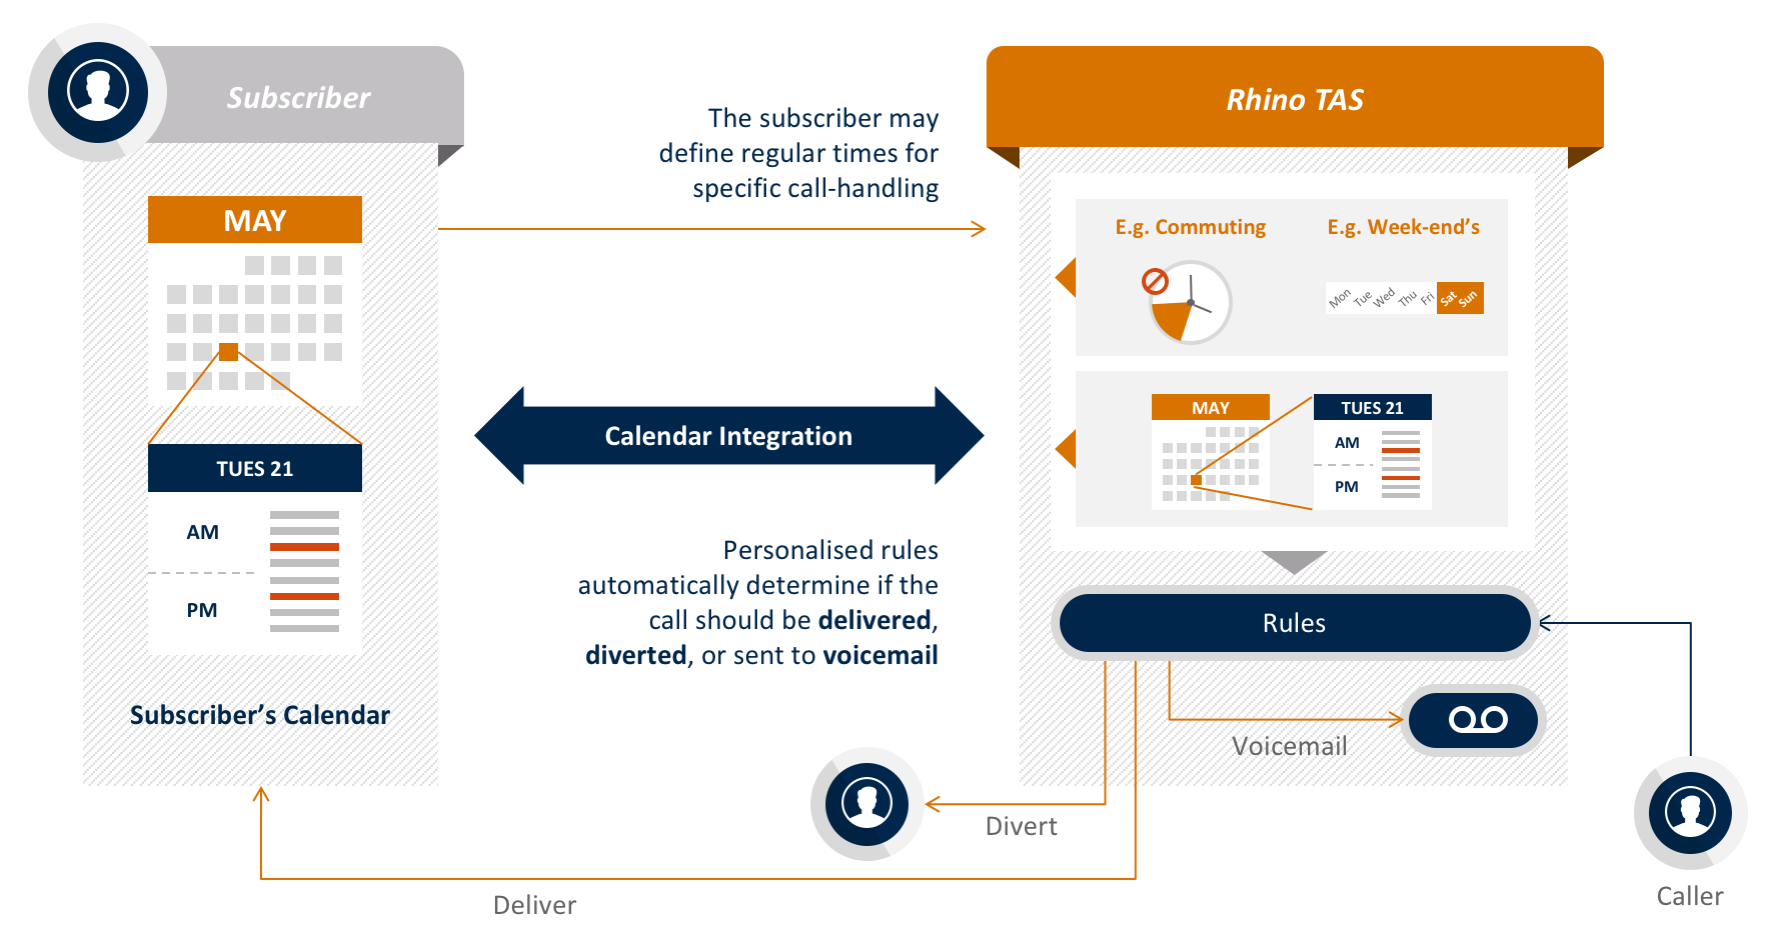 rhino-tas-app-calendar-based-call-handling